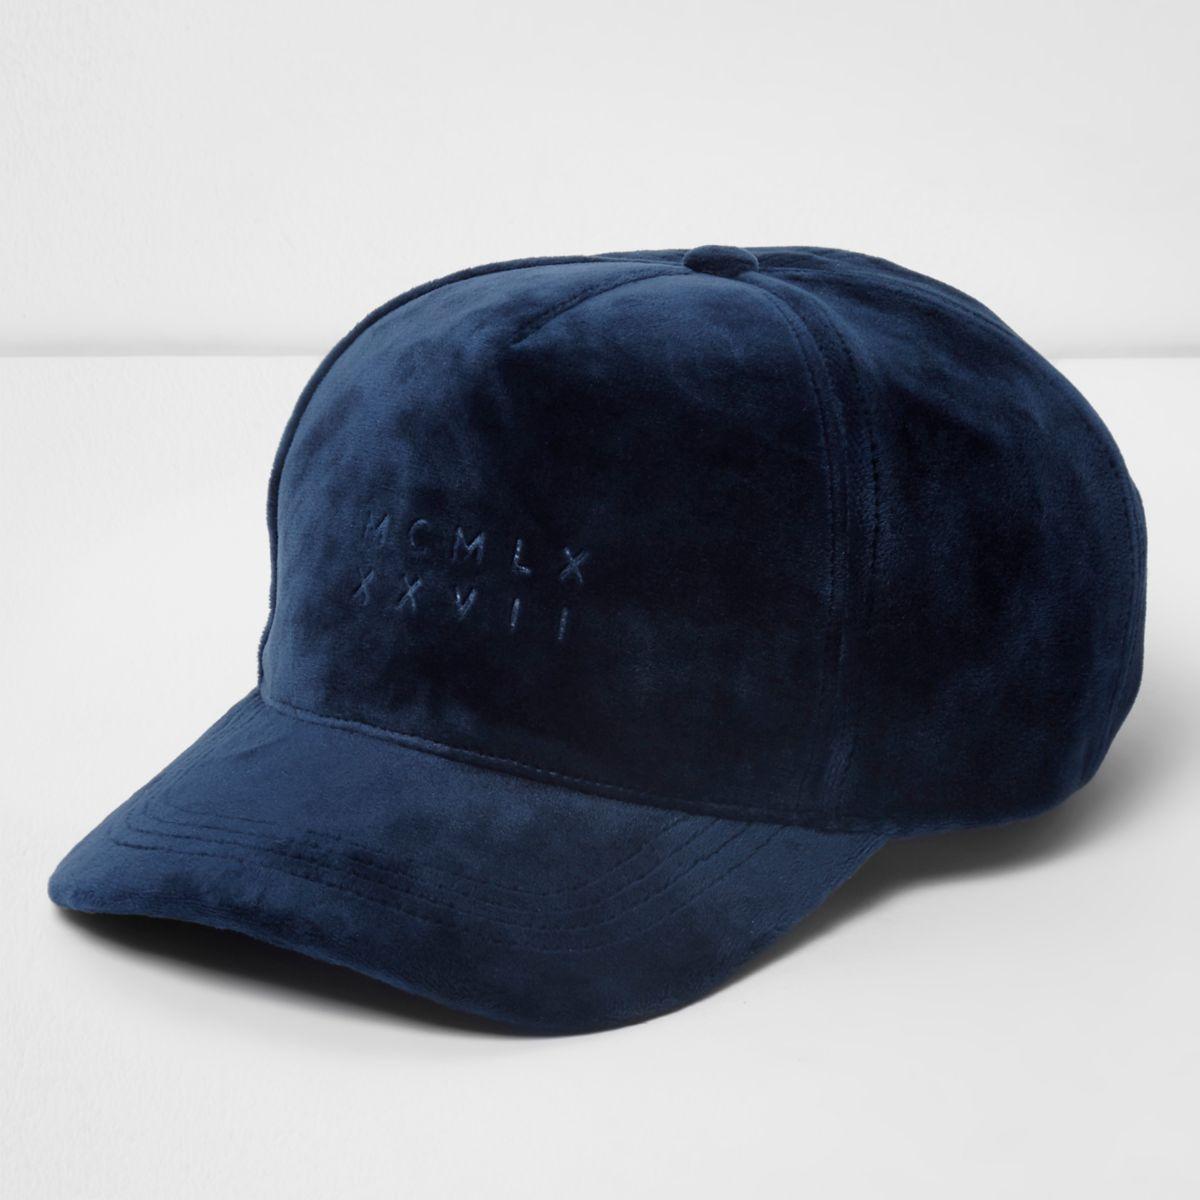 Casquette de baseball en velours bleu